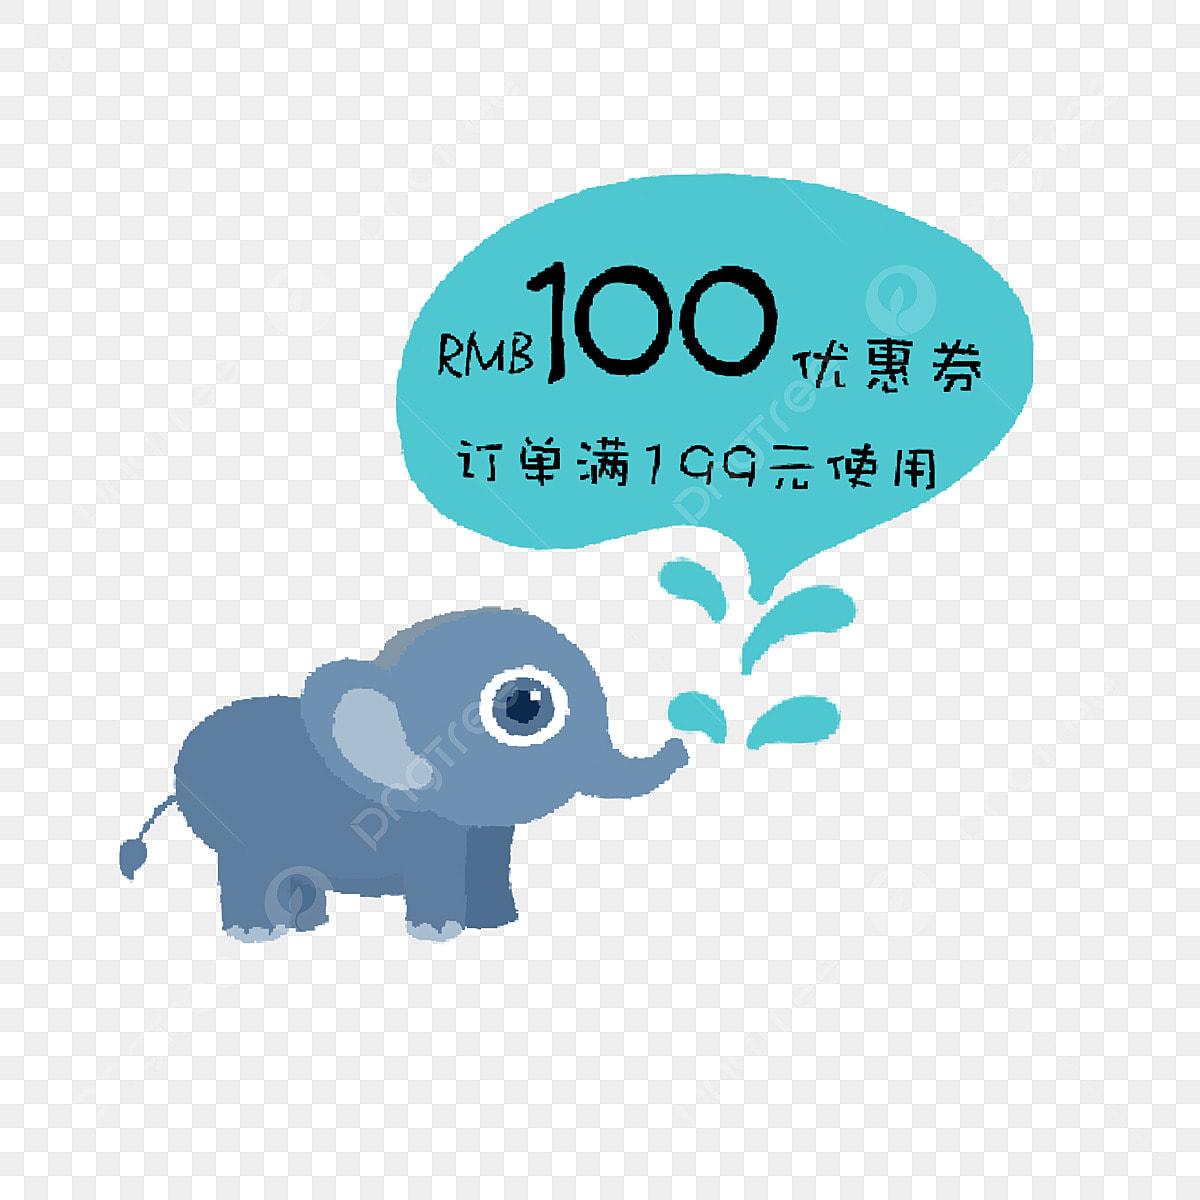 Gajah Air Semburan Hidung Gajah Bayi Pengurangan Harga Kupon